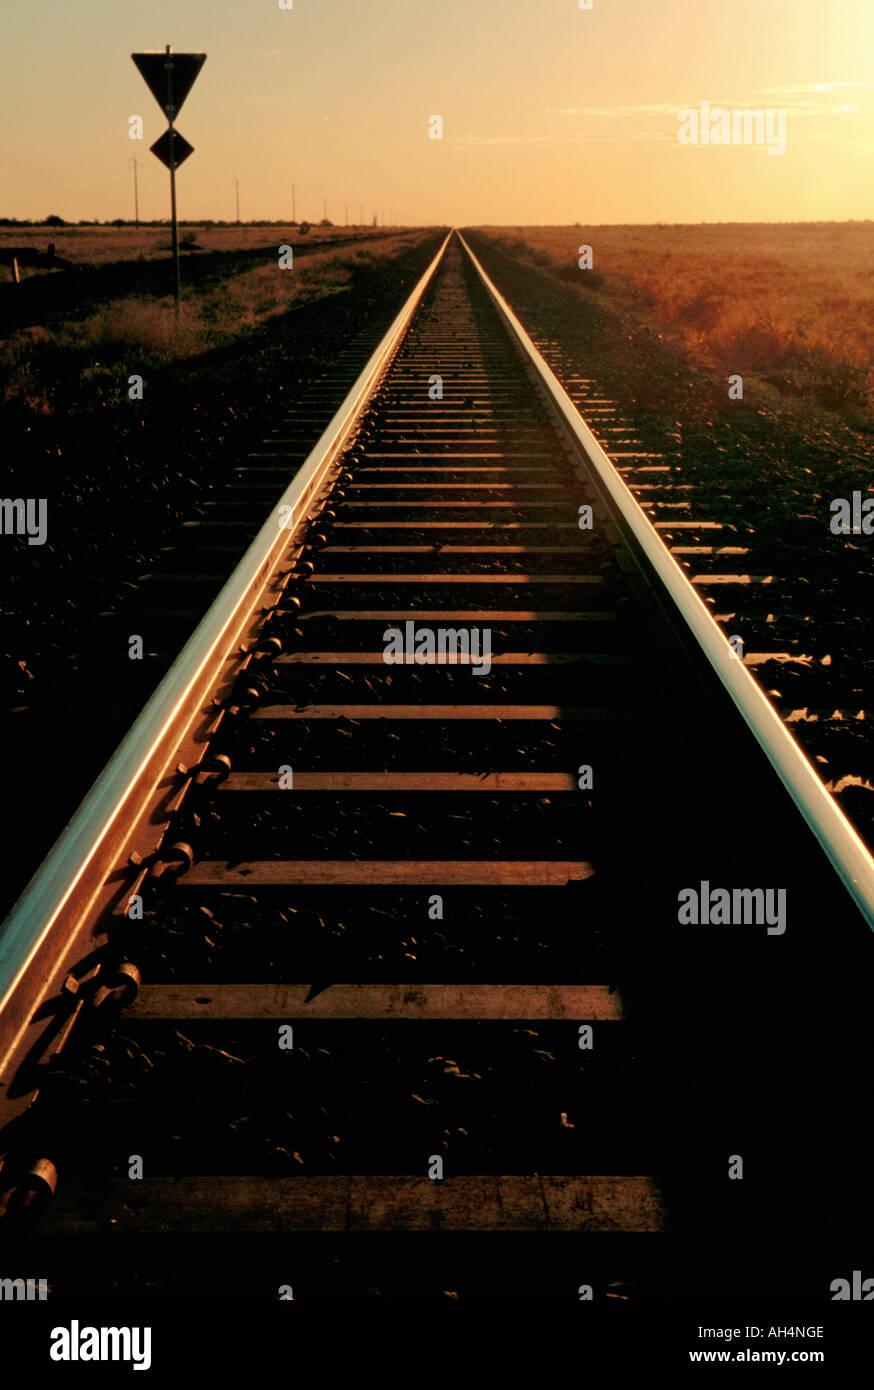 railway tracks crossing landscape, Northern Territory, Australia - Stock Image